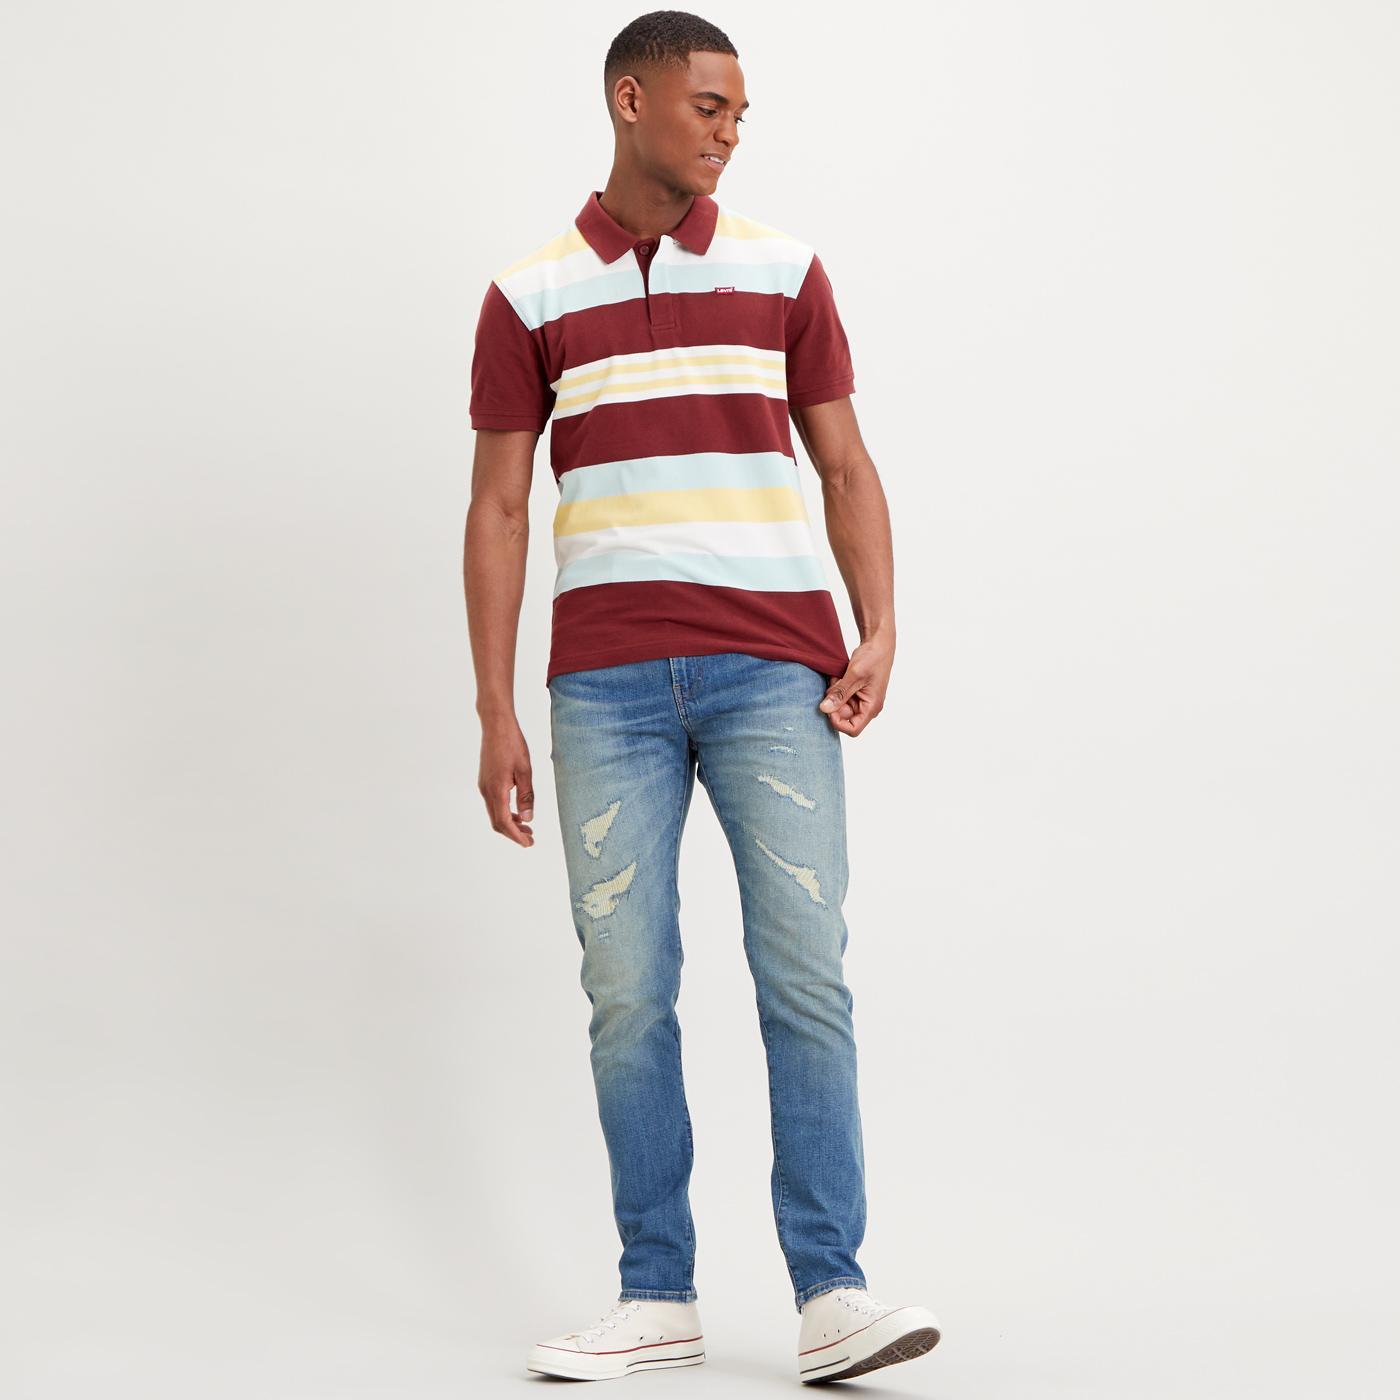 LEVI'S Retro Mod Variegated Stripe Polo Shirt PORT